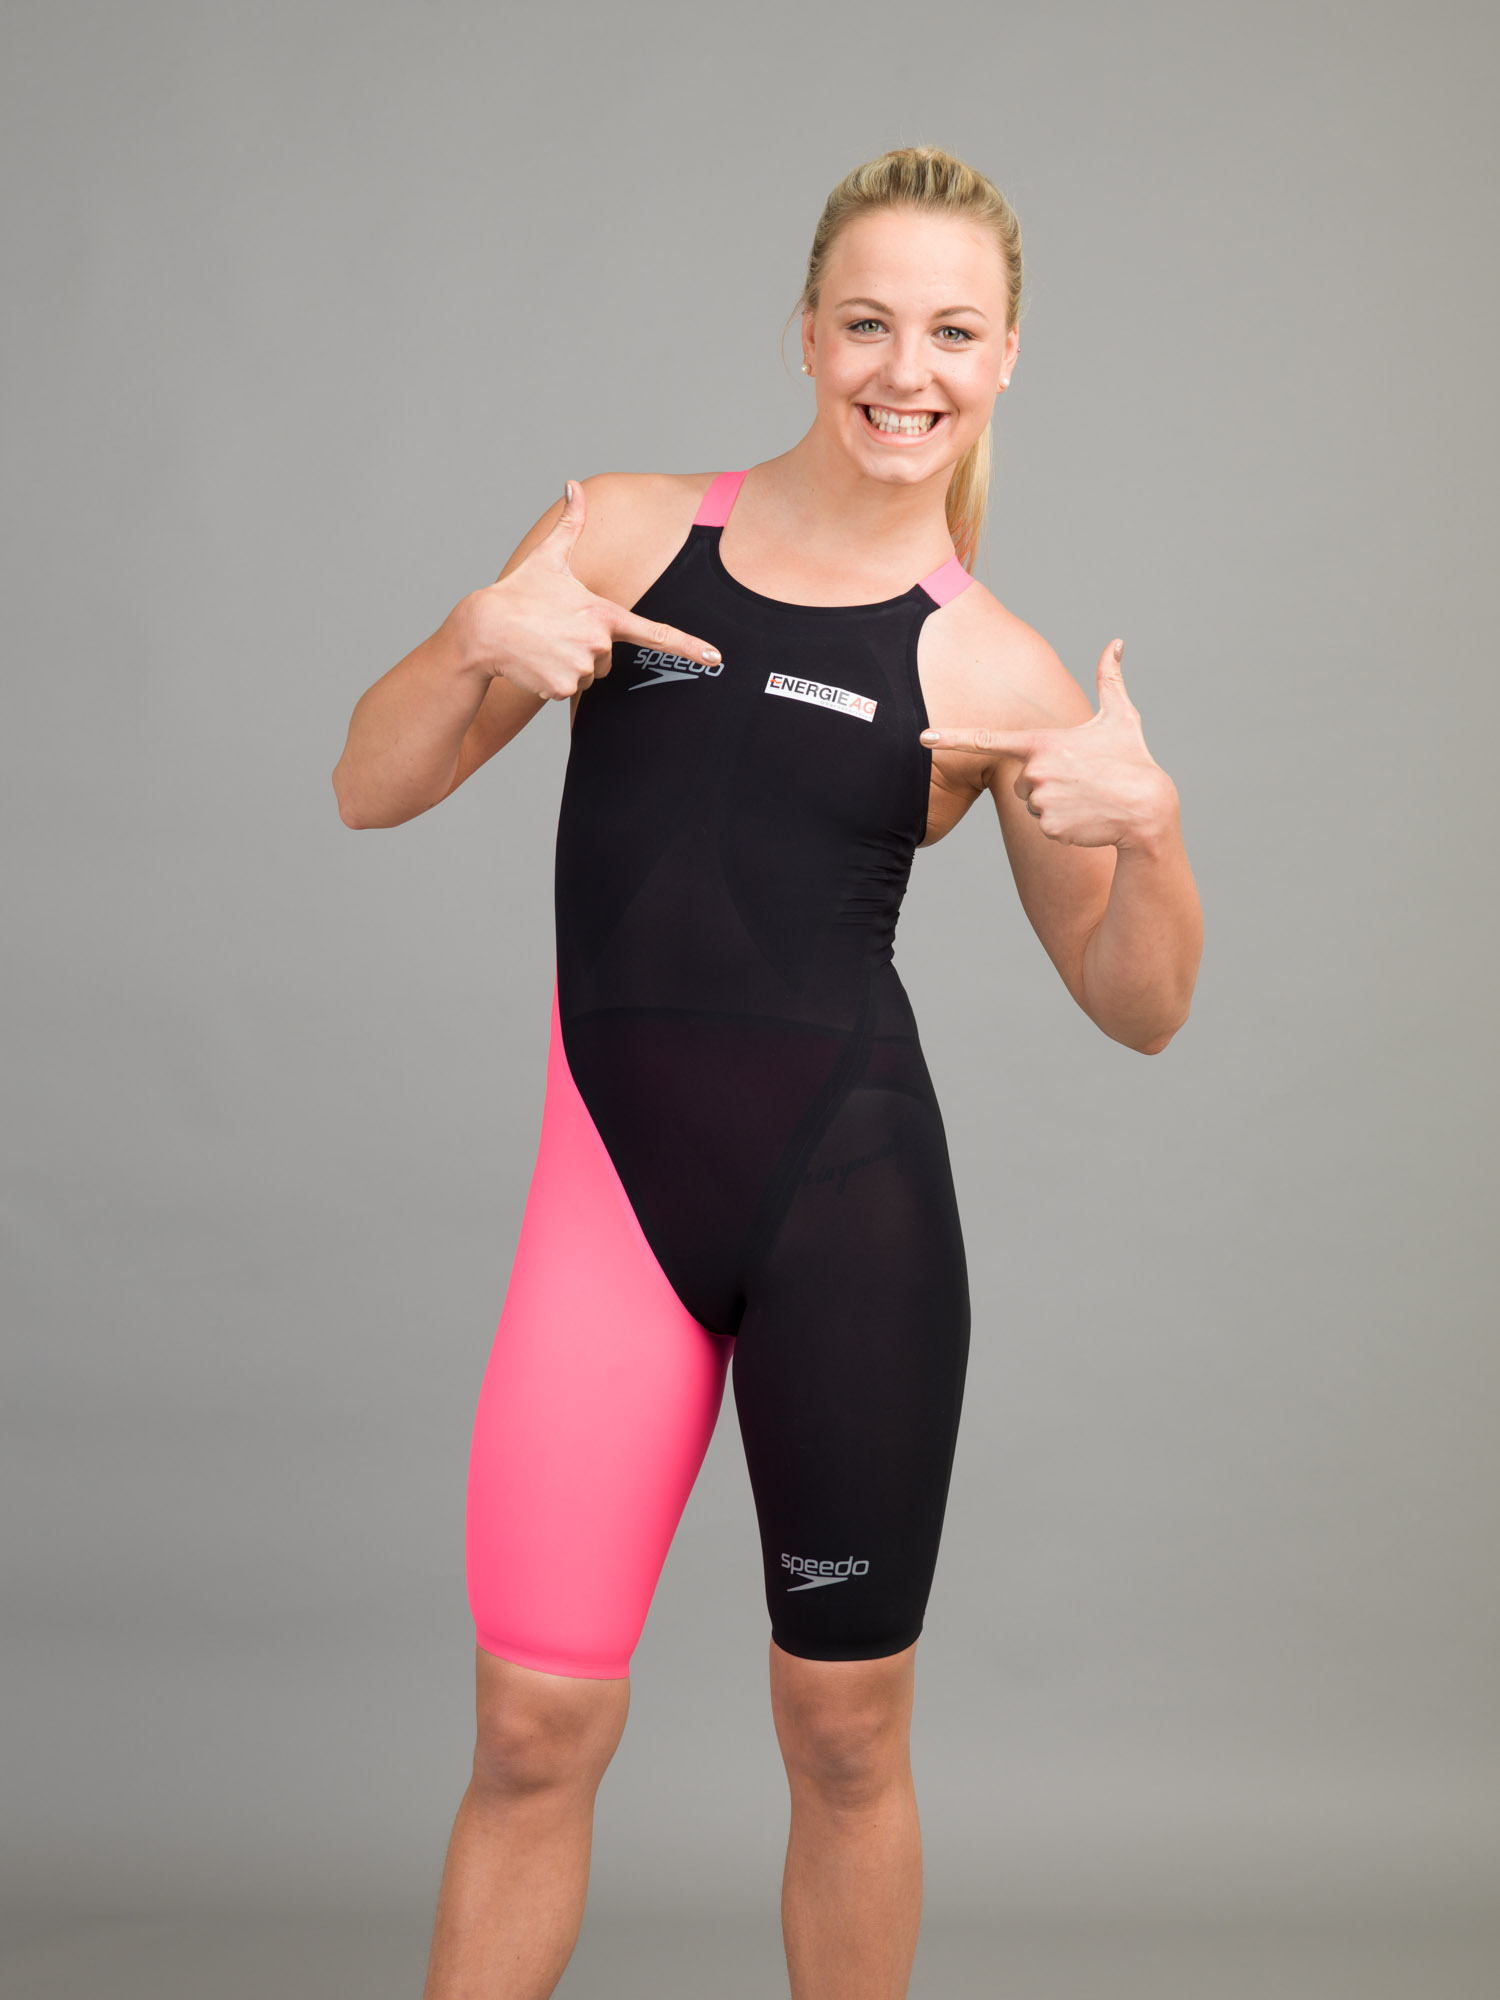 Lisa Zaiser NEU in der Energie AG-Sportfamilie! - Energie